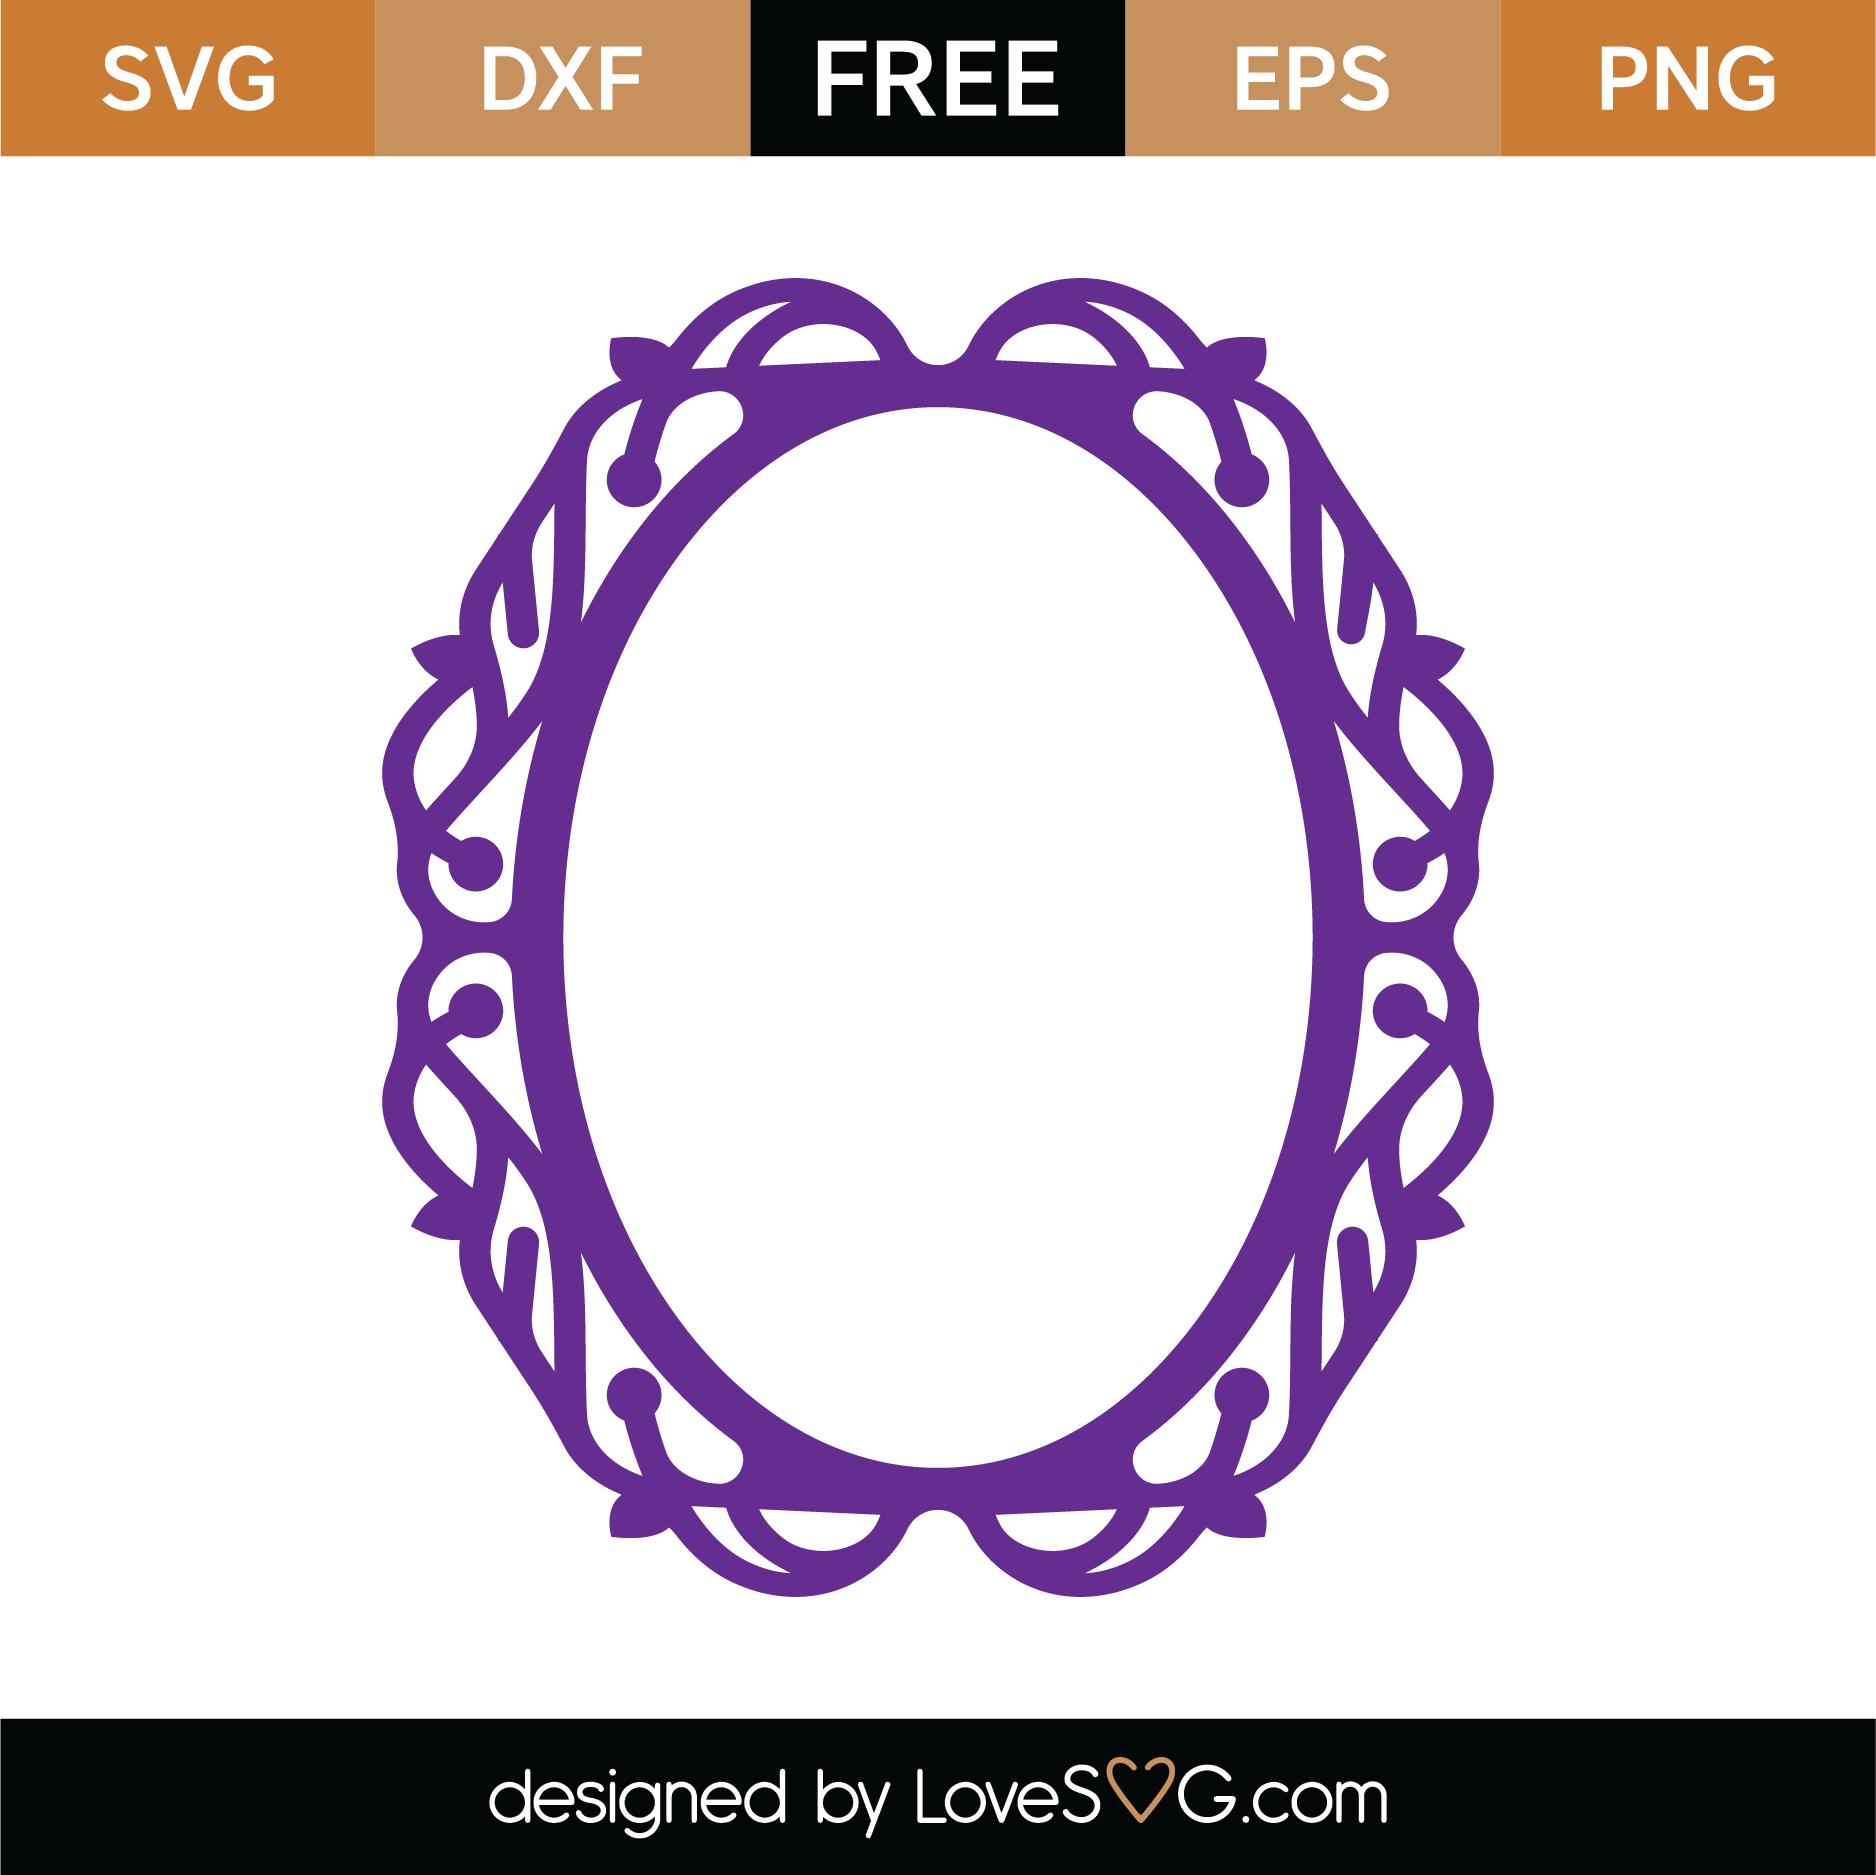 12345+ Free Svg File Monogram Ppular Design